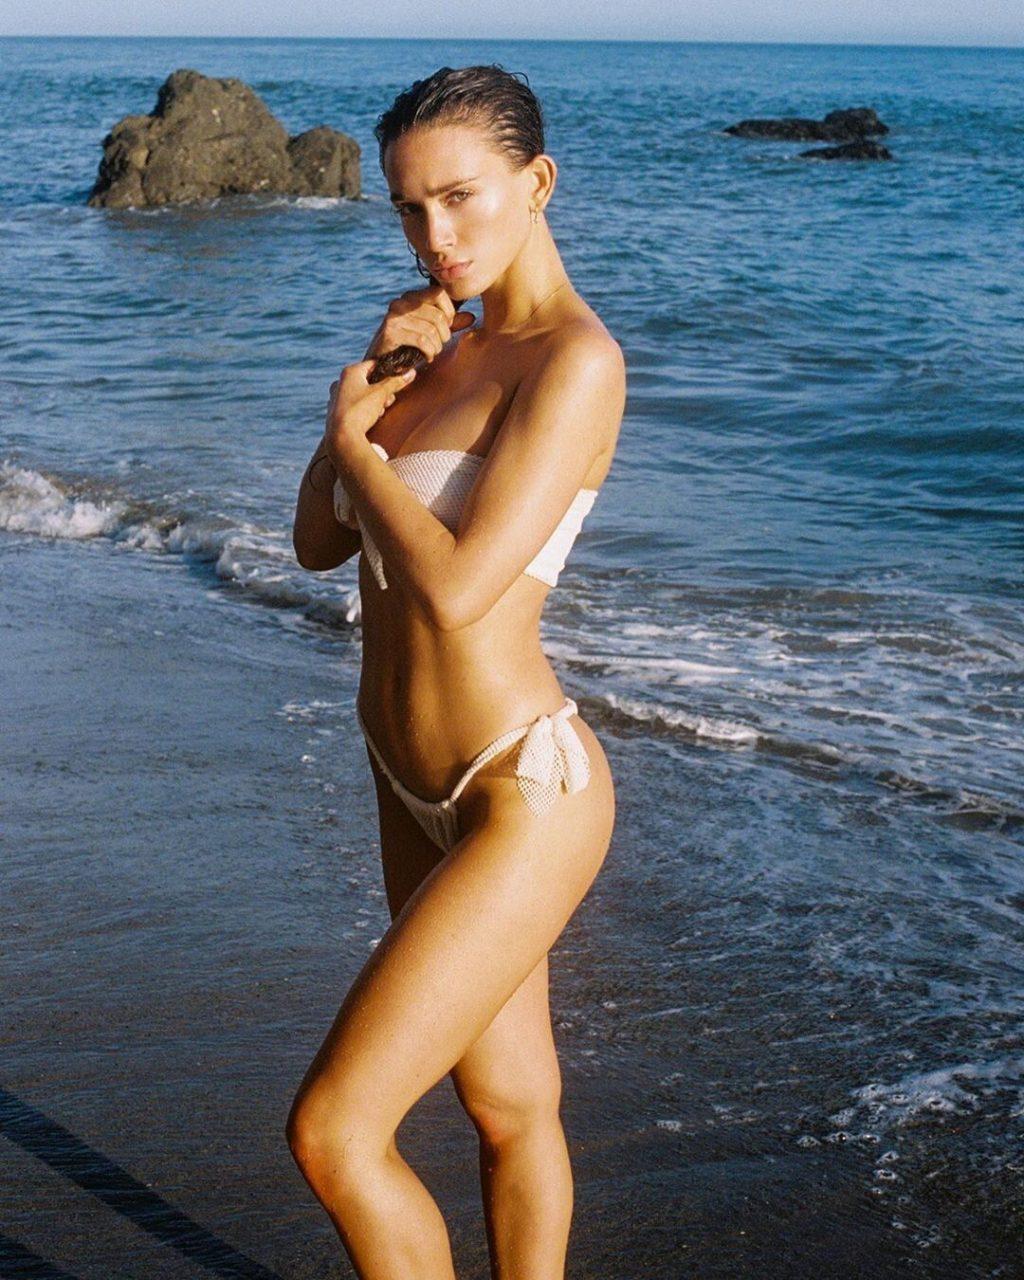 Jordyn Johnson Nude Sexy Thefappeningblog Com 81 1024x1280